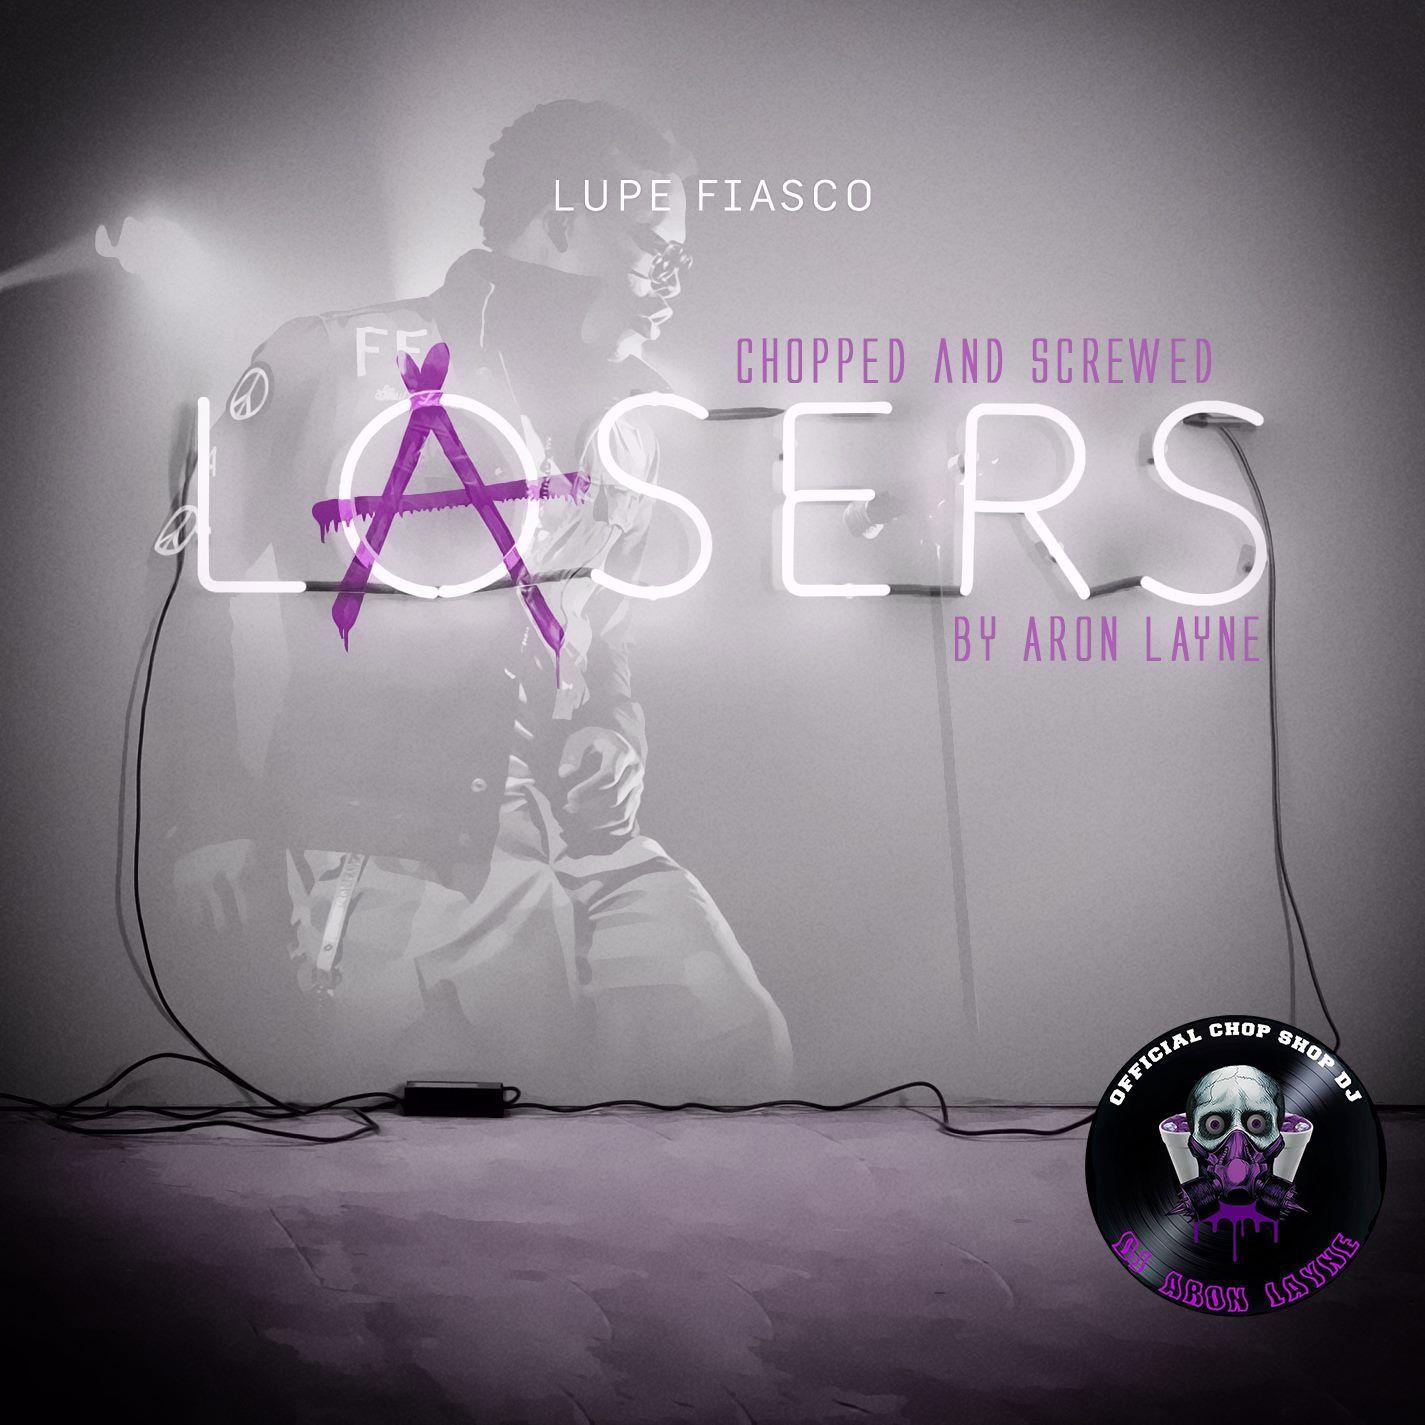 "Lupe Fiasco,DJ ARONlayne - ""Lasers"" ''Slowed&Chopped"" By ..."